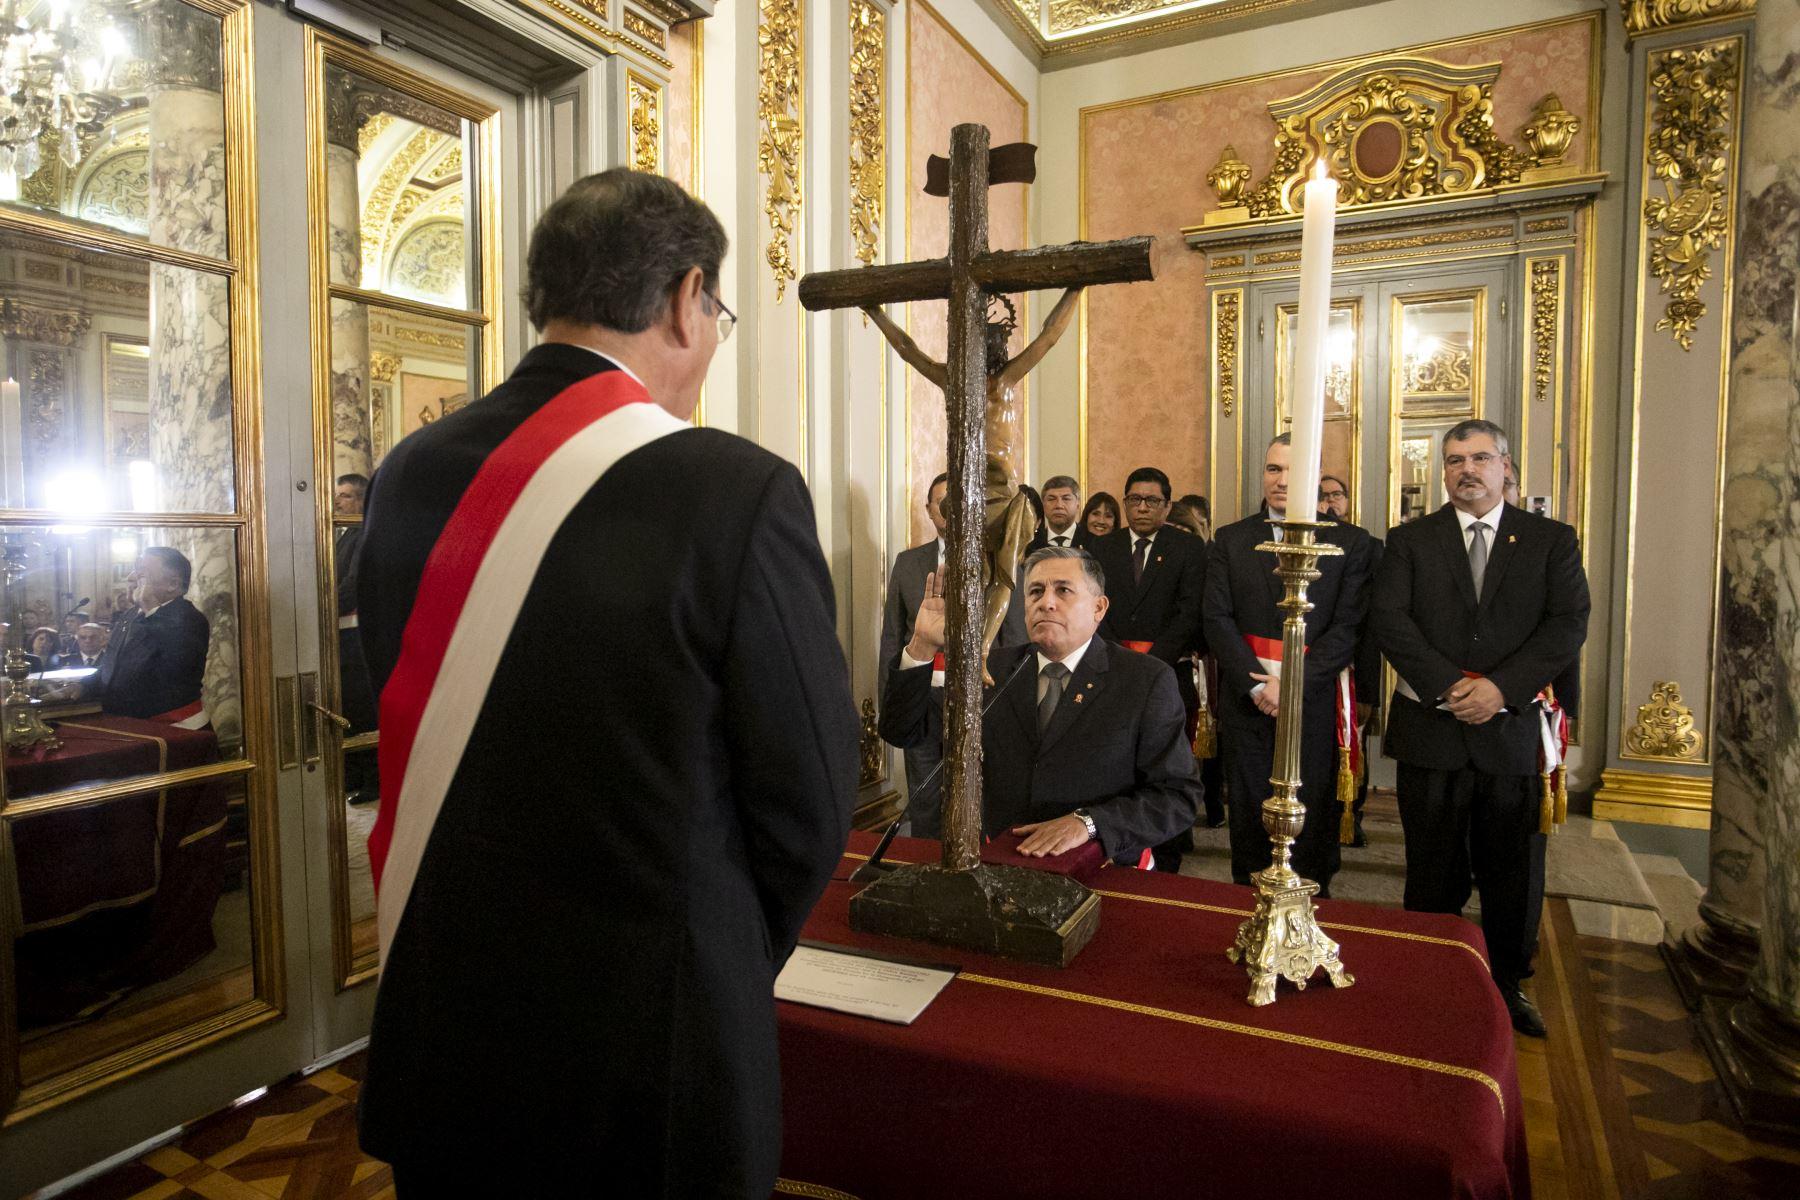 El presidente Martín Vizcarra tomó hoy juramento al vicealmirante en retiro Jorge Moscoso Flores como ministro de Defensa.Foto: ANDINA/Prensa Presidencia